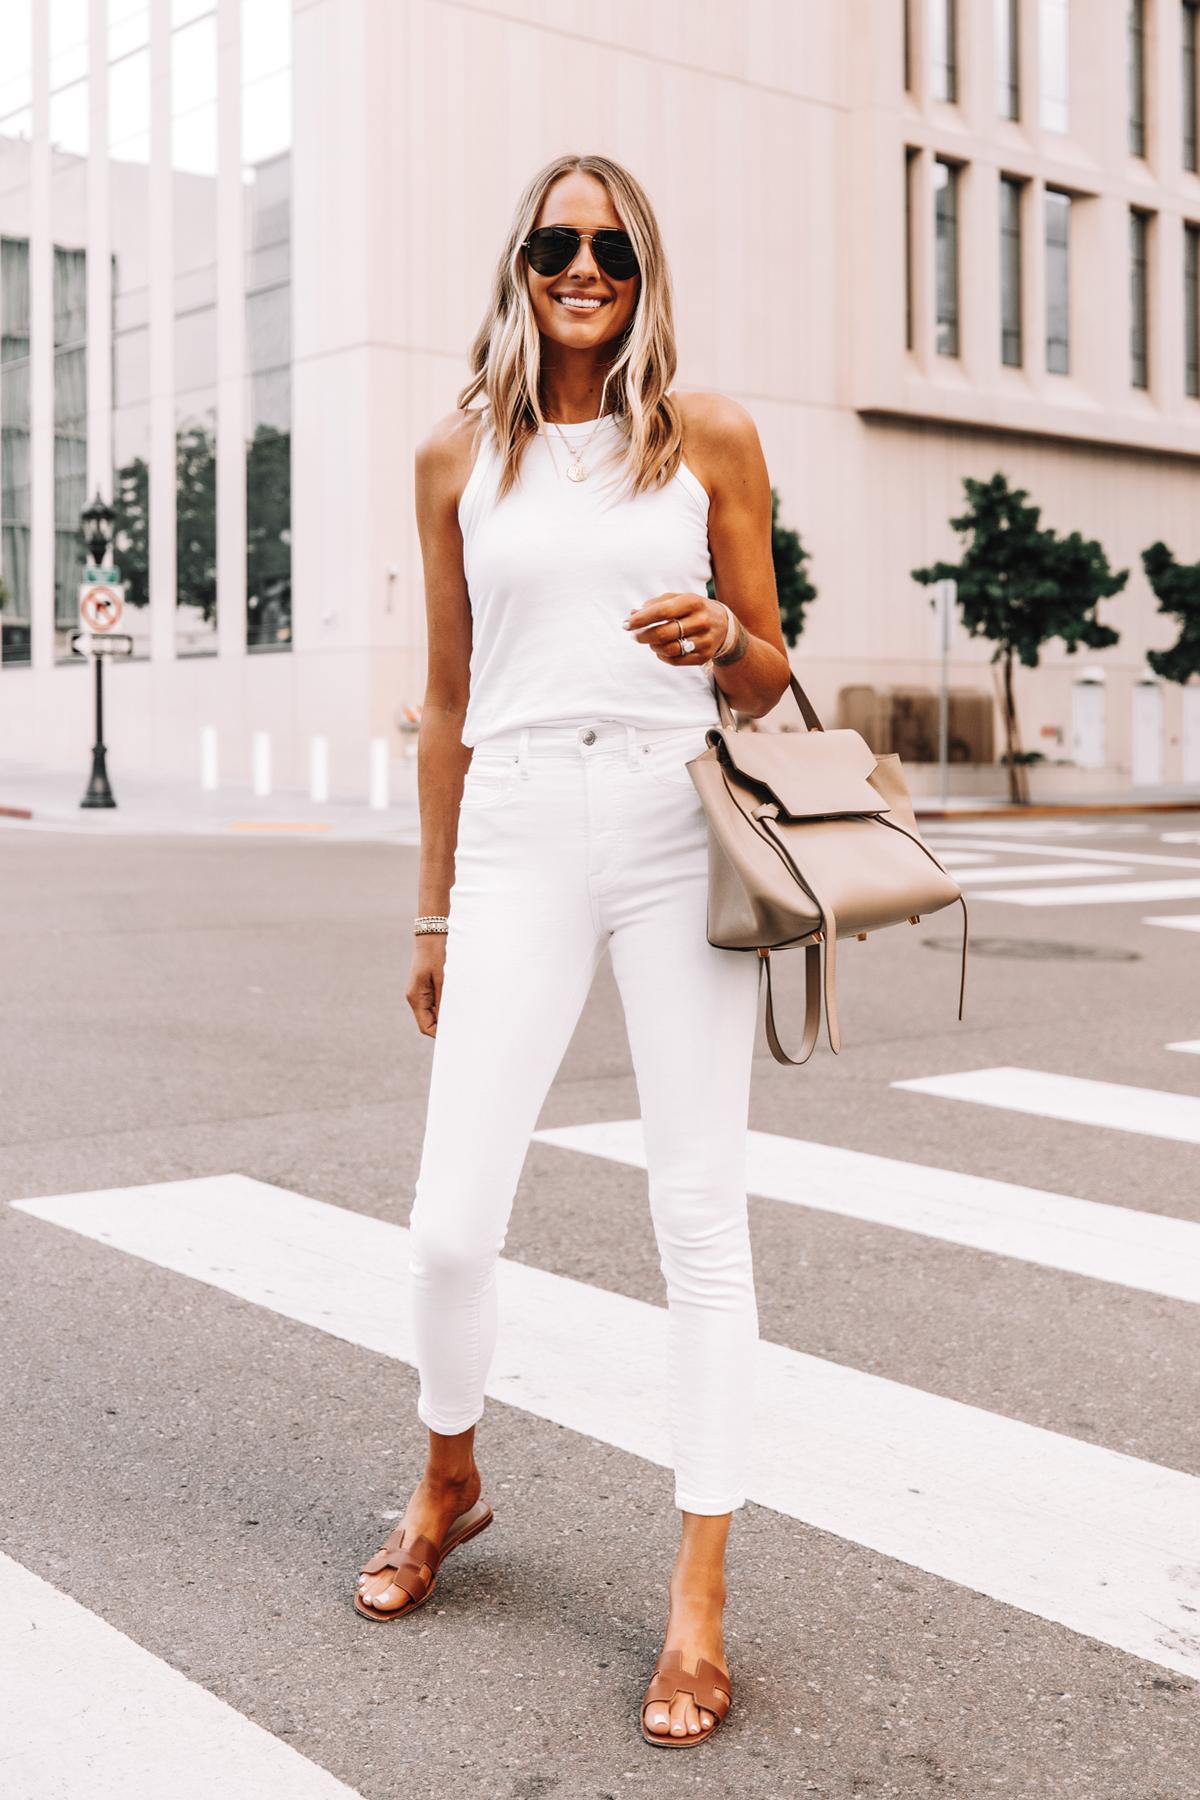 Fashion Jackson Wearing Everlane White The Organic Cotton Cutaway Tank Everlane White Skinny Jeans Hermes Oran Sandals Celine Belt Bag